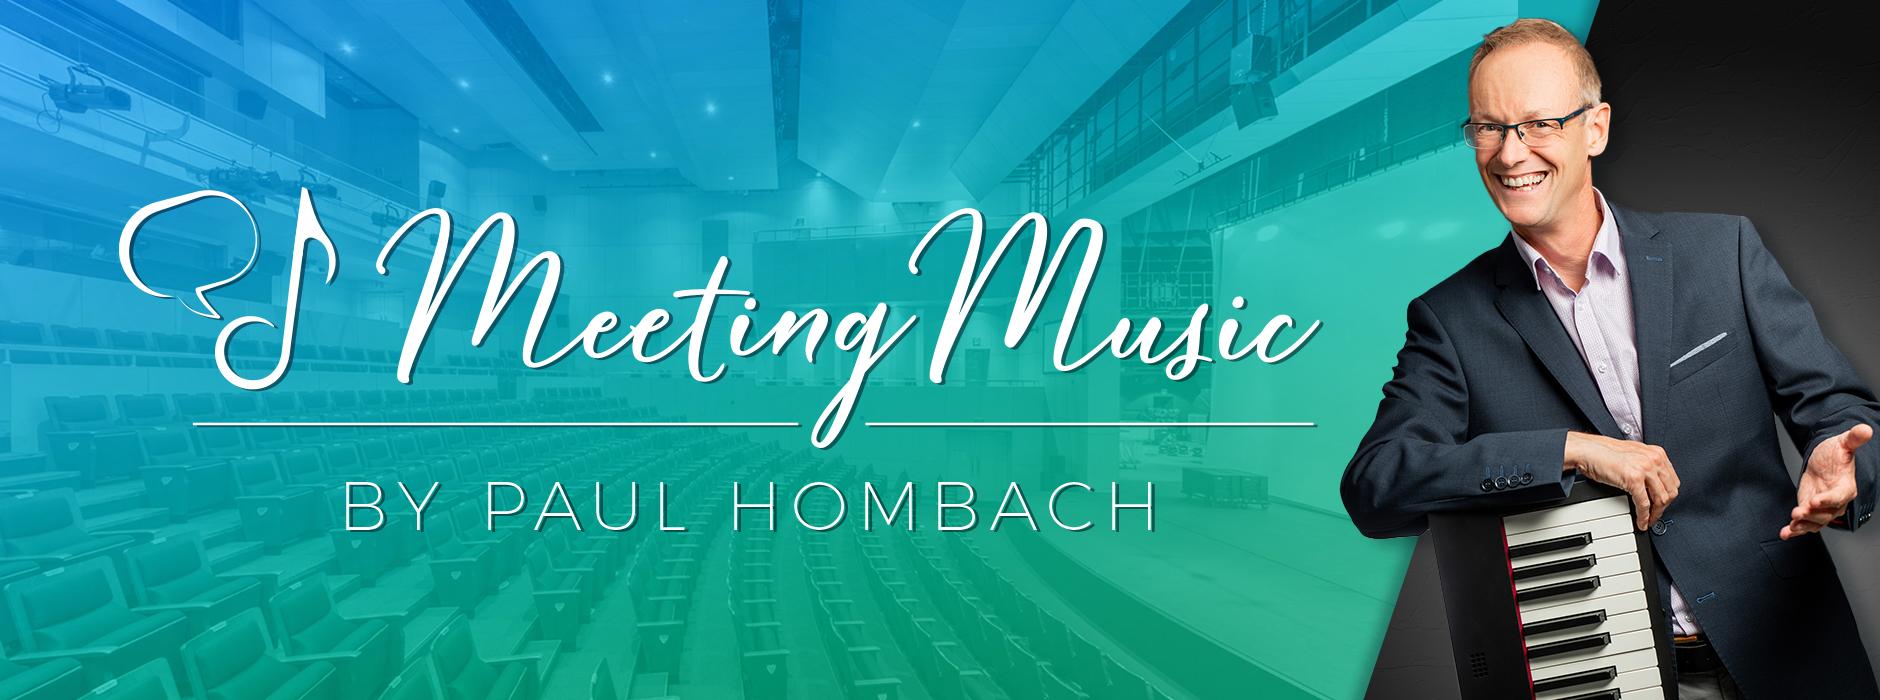 MeetingMusic by Paul Hombach